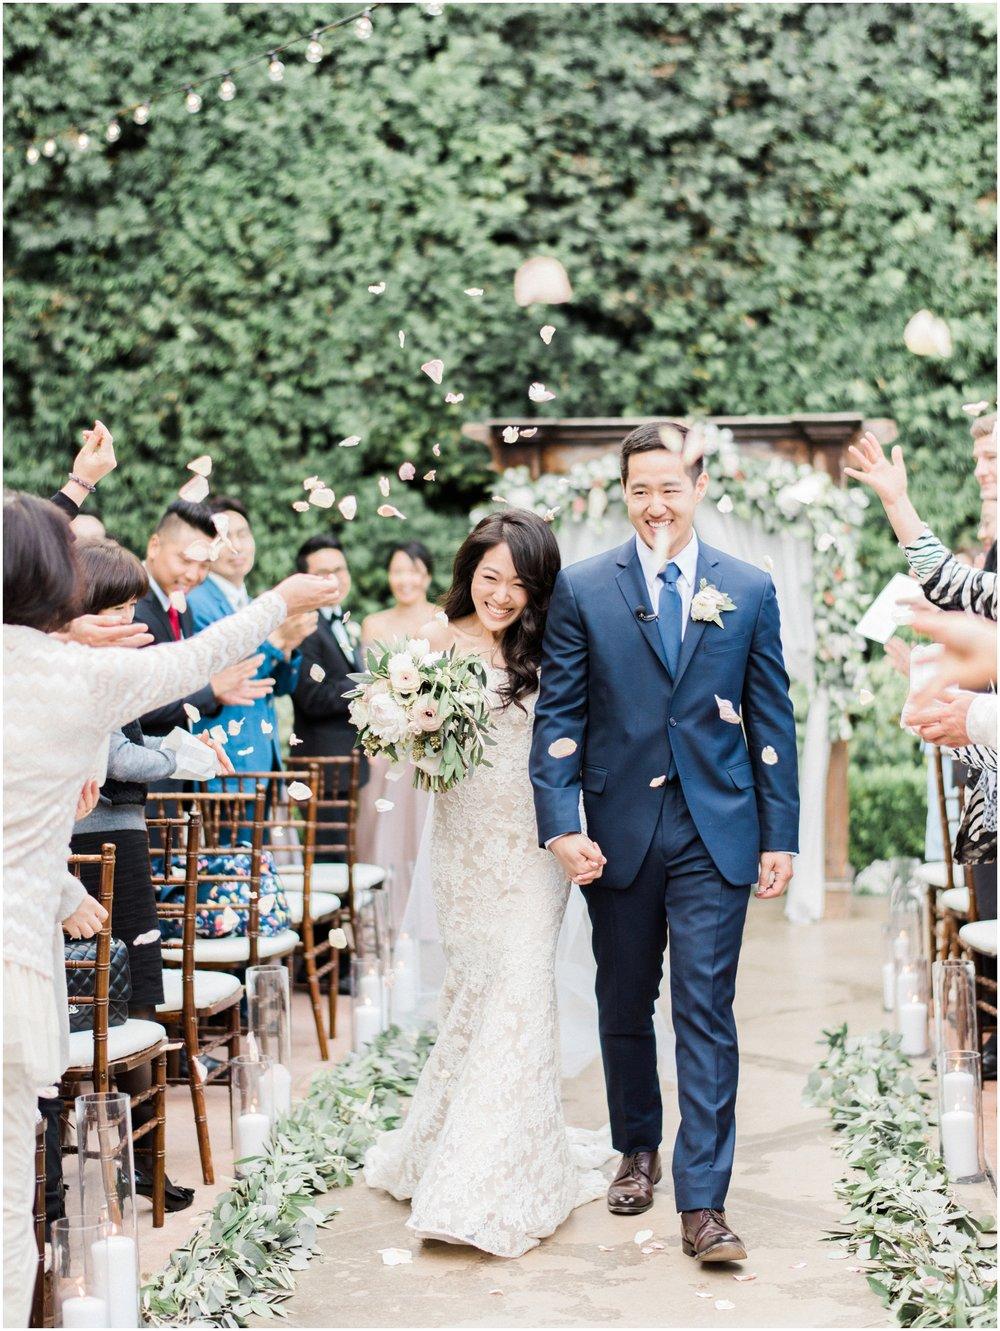 franciscan-gardens-san-juan-capistrano-wedding_0014.jpg